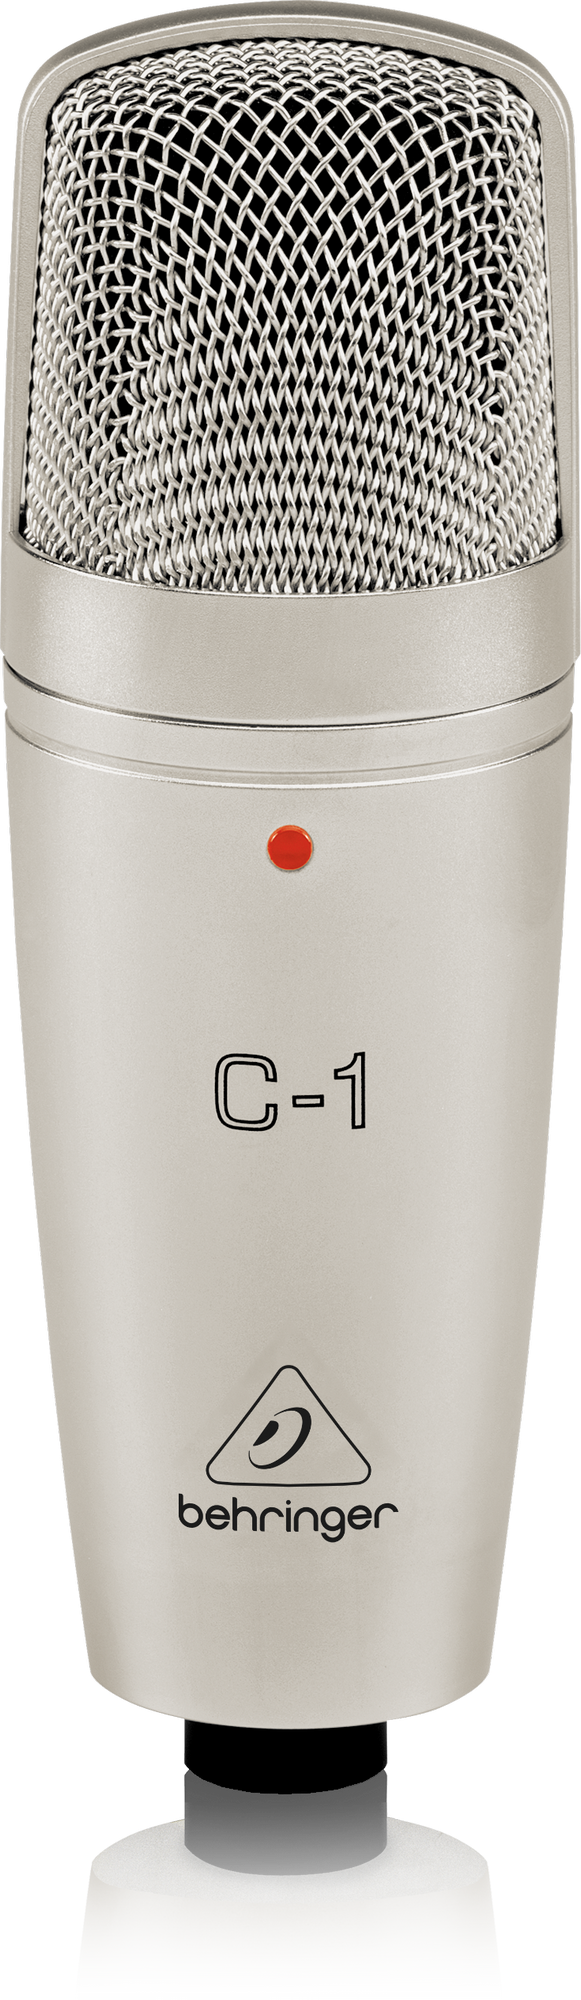 Behringer C-1 - Studio Condenser Microphone